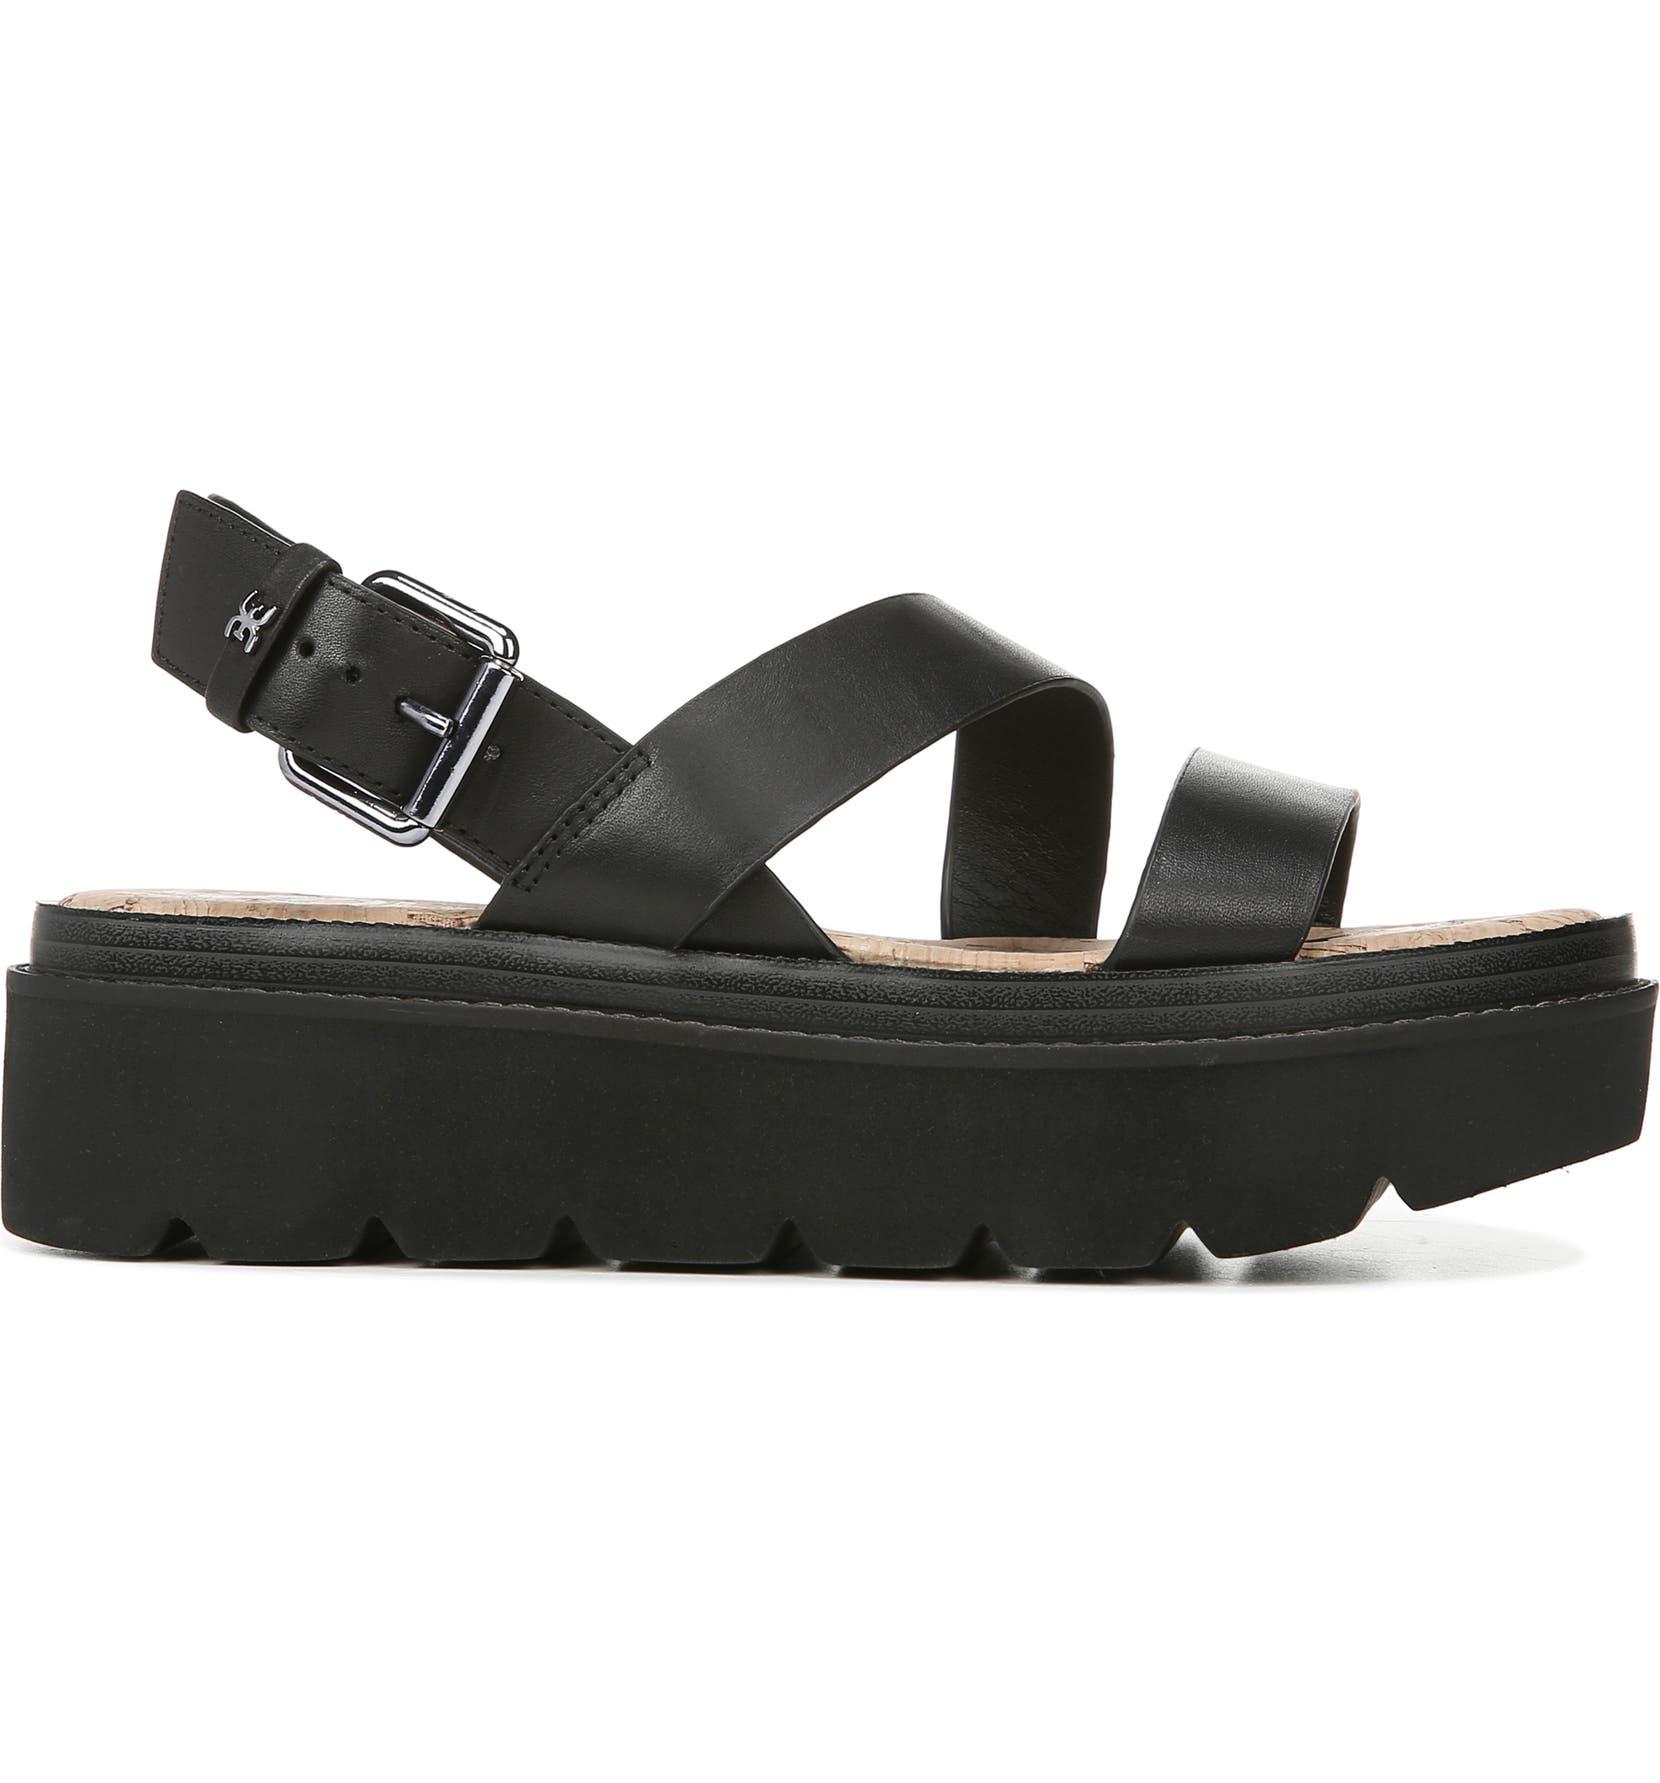 03c5422e83b2 Sam Edelman Rasheed Slingback Platform Sandal (Women)